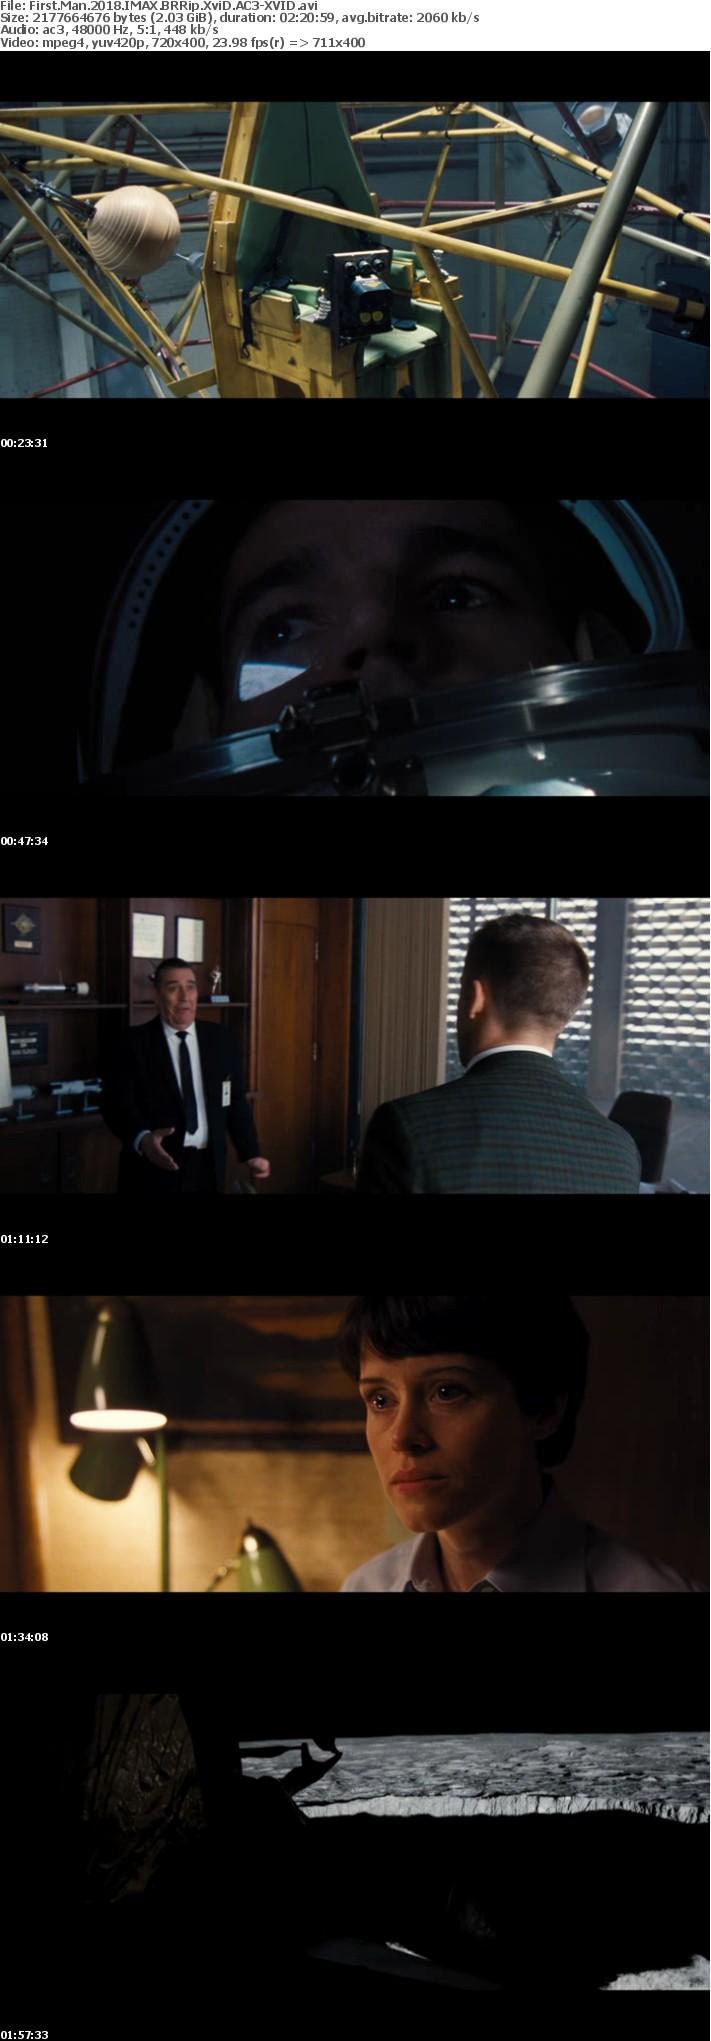 First Man 2018 IMAX BRRip XviD AC3-XVID